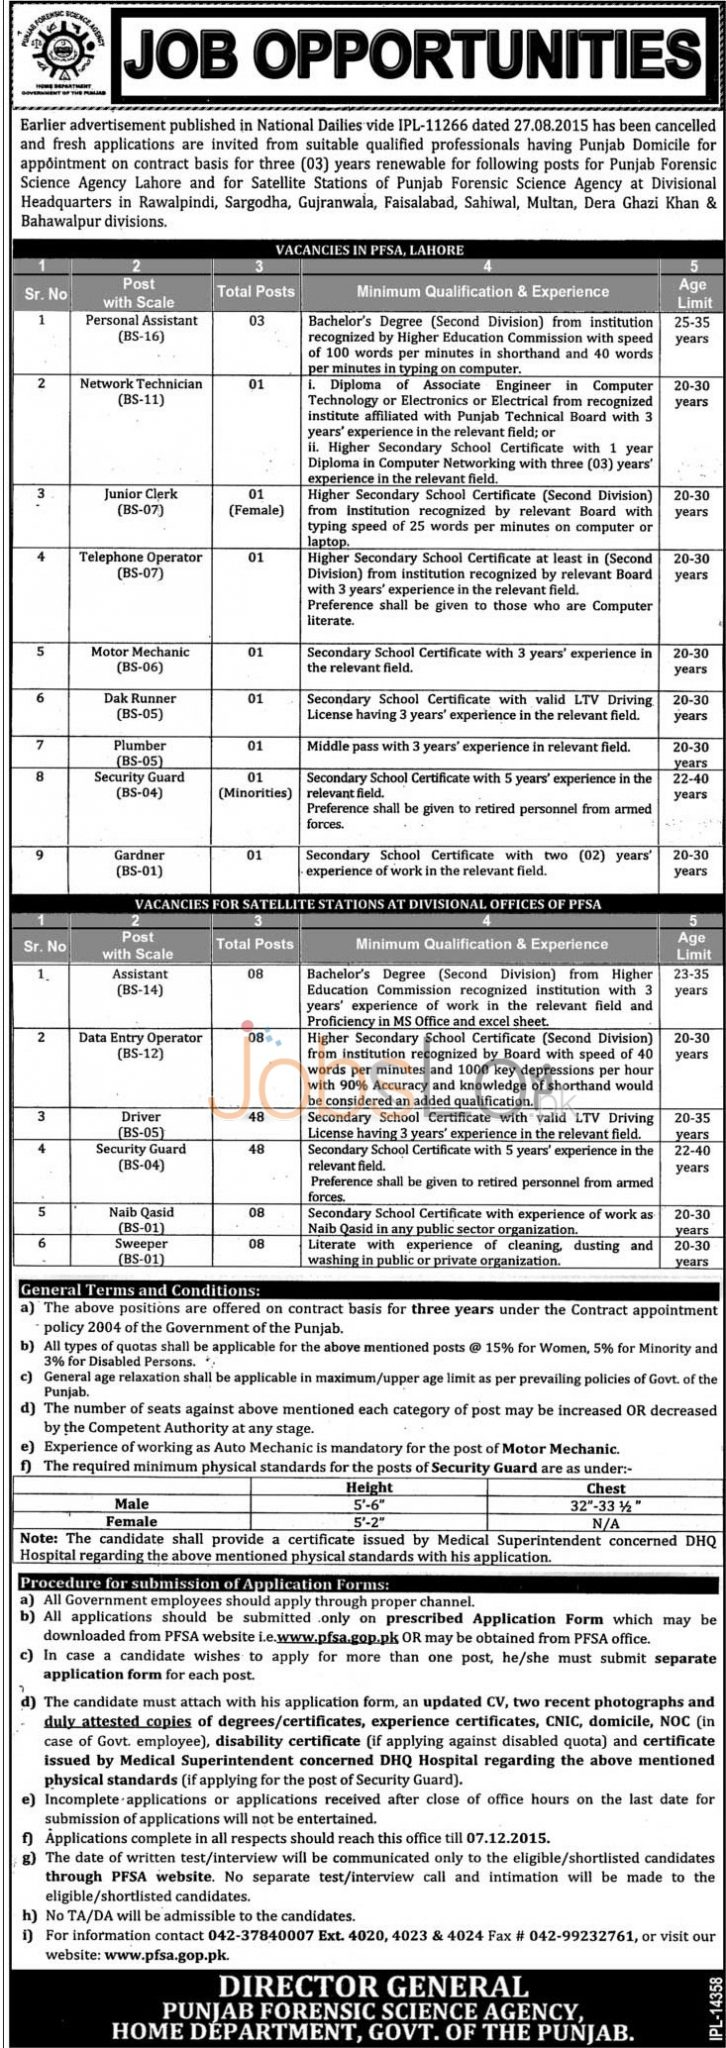 Punjab Forensic Science Agency Jobs November 2015 Application Form